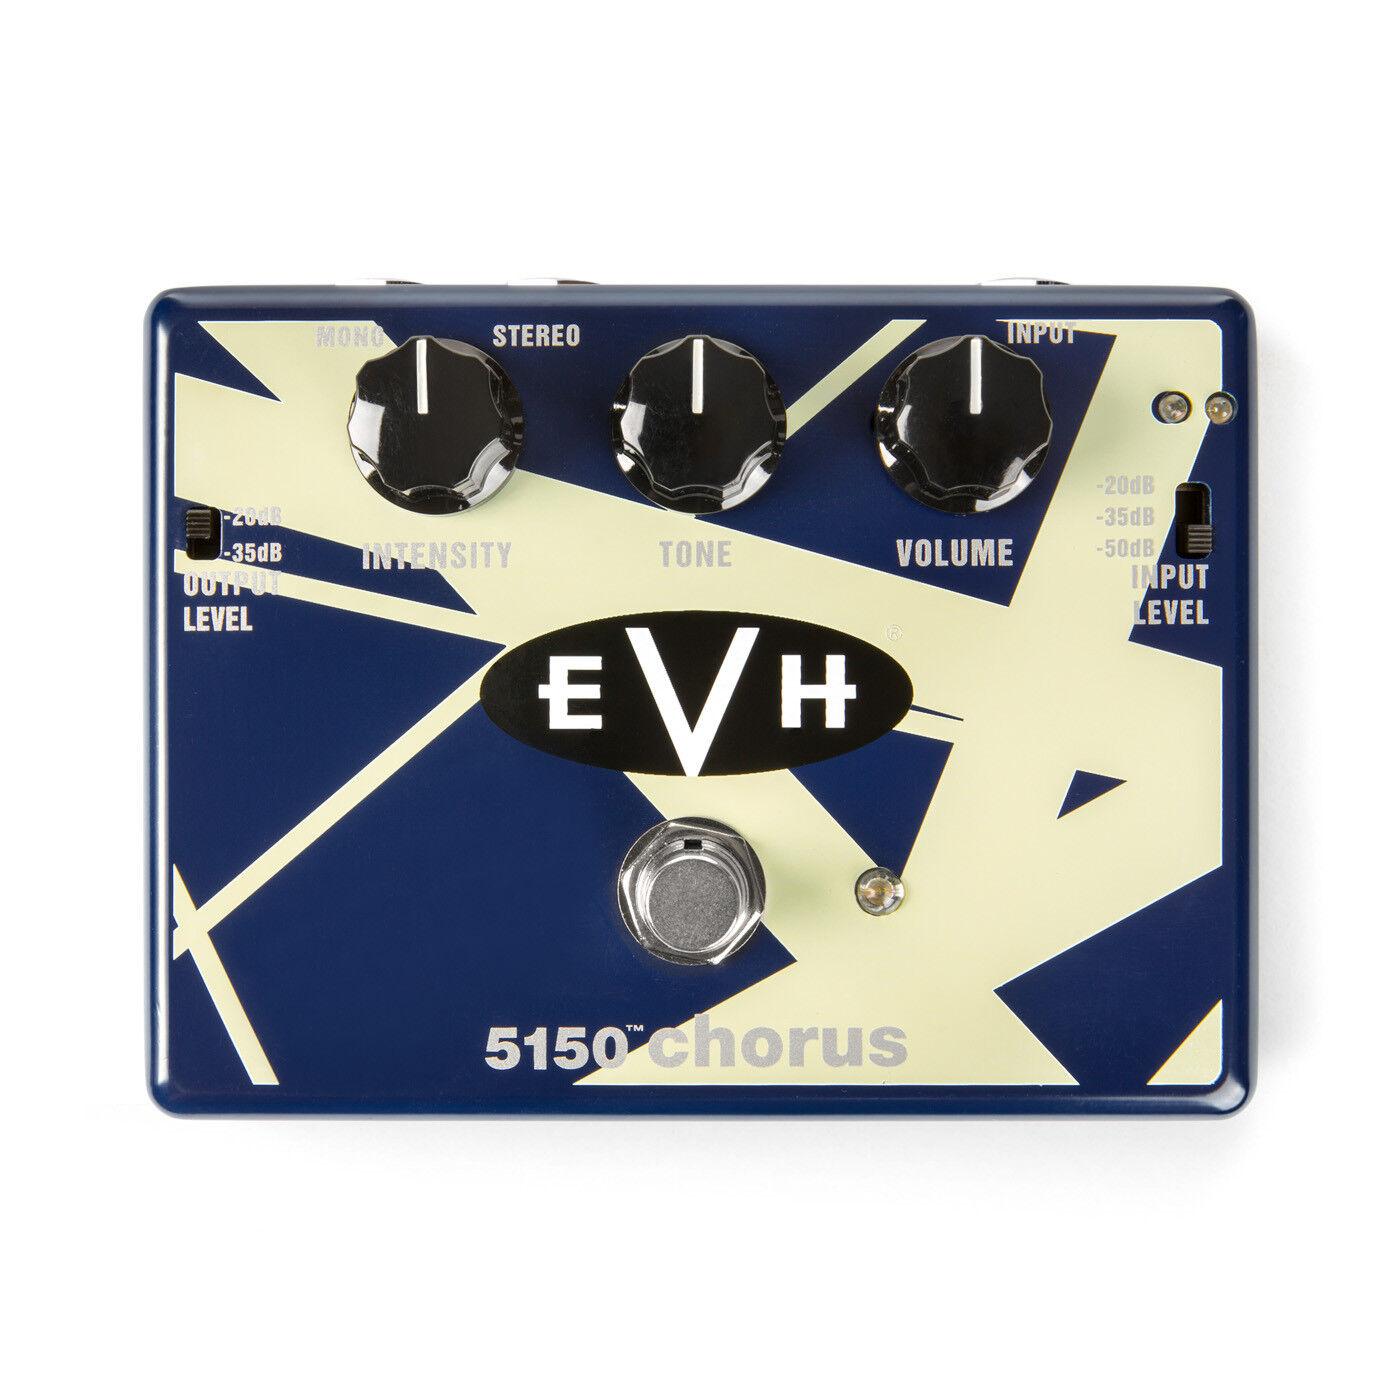 MXR Dunlop EVH 5150 Stereo Chorus Guitar Pedal EVH30 Eddie Van Halen (OPEN BOX)